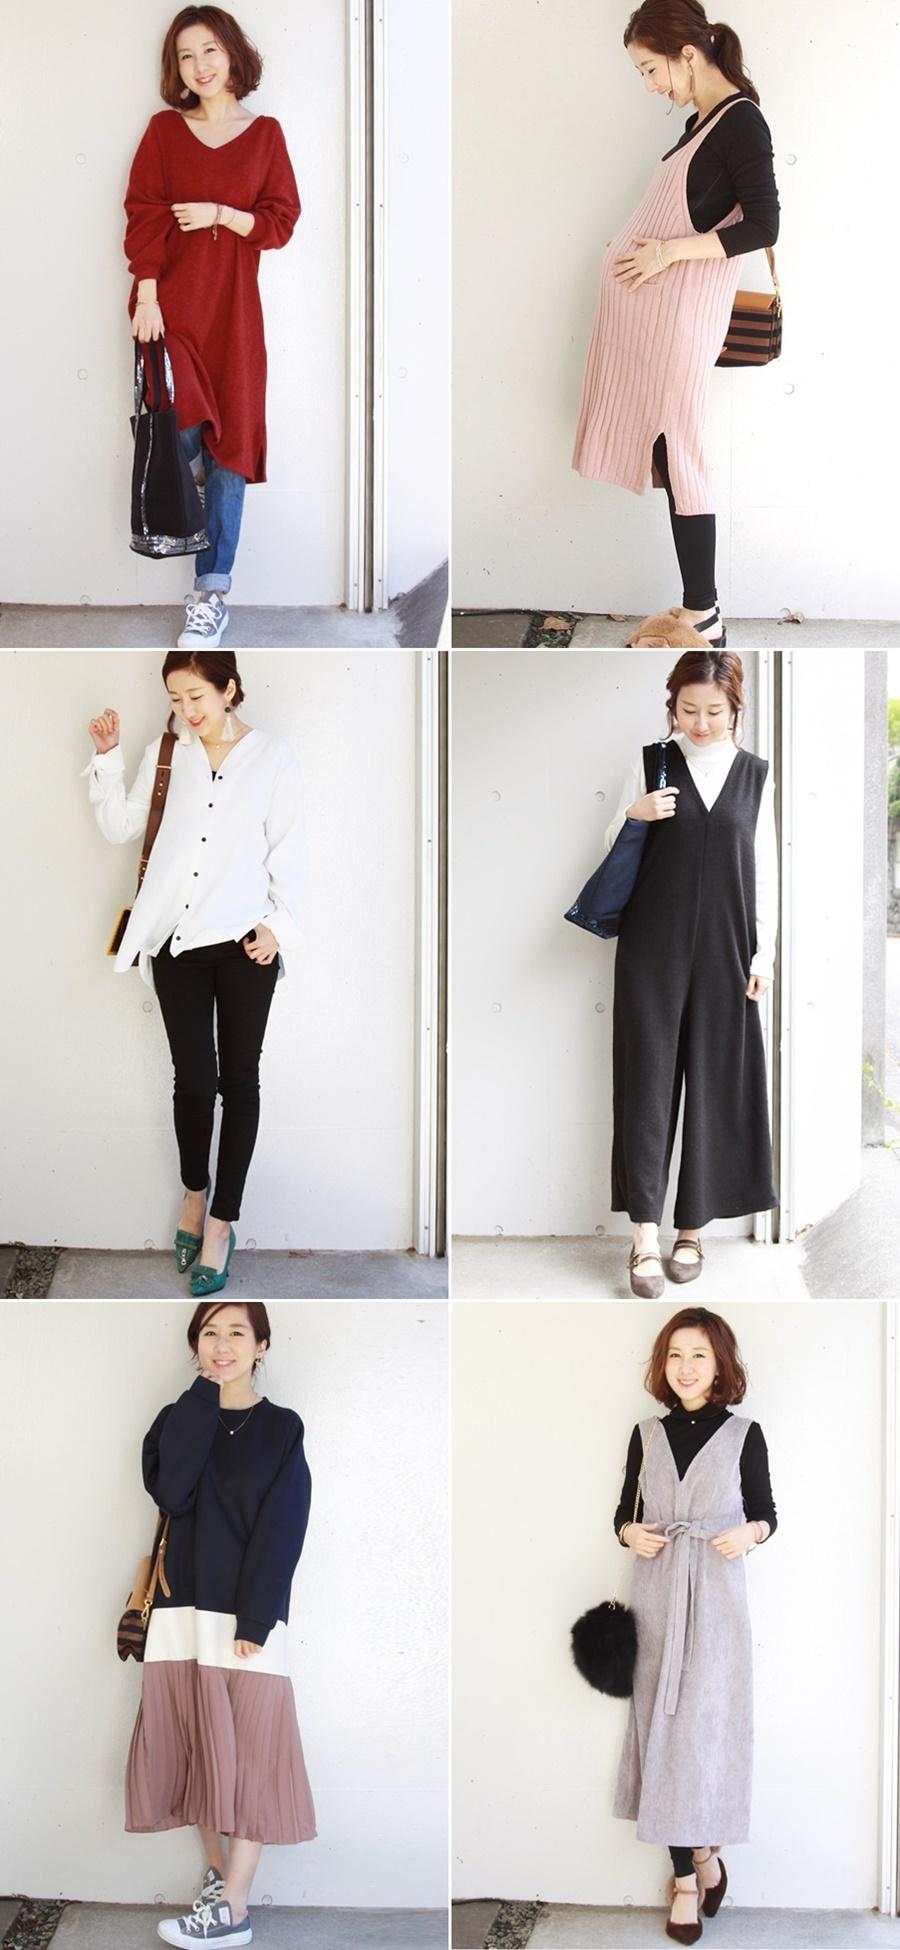 f8ade7109eca6 マタニティ・授乳服プチプラブランド通販4選!可愛くオシャレに☆ – Lety